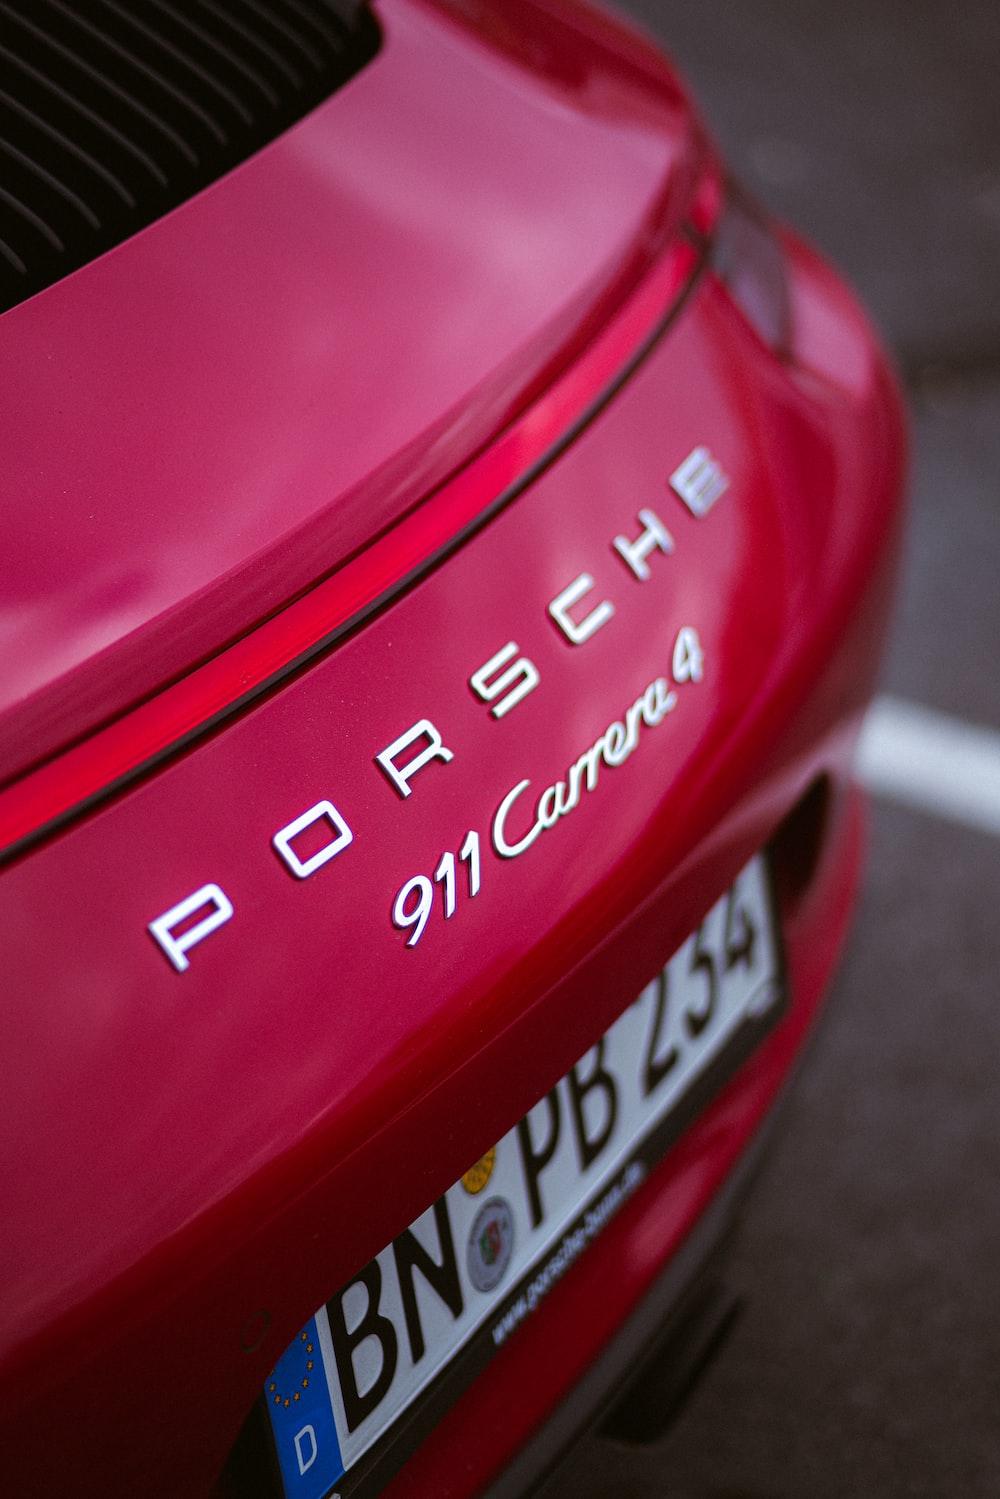 shallow focus photo of red Porsche 911 Carrera 4